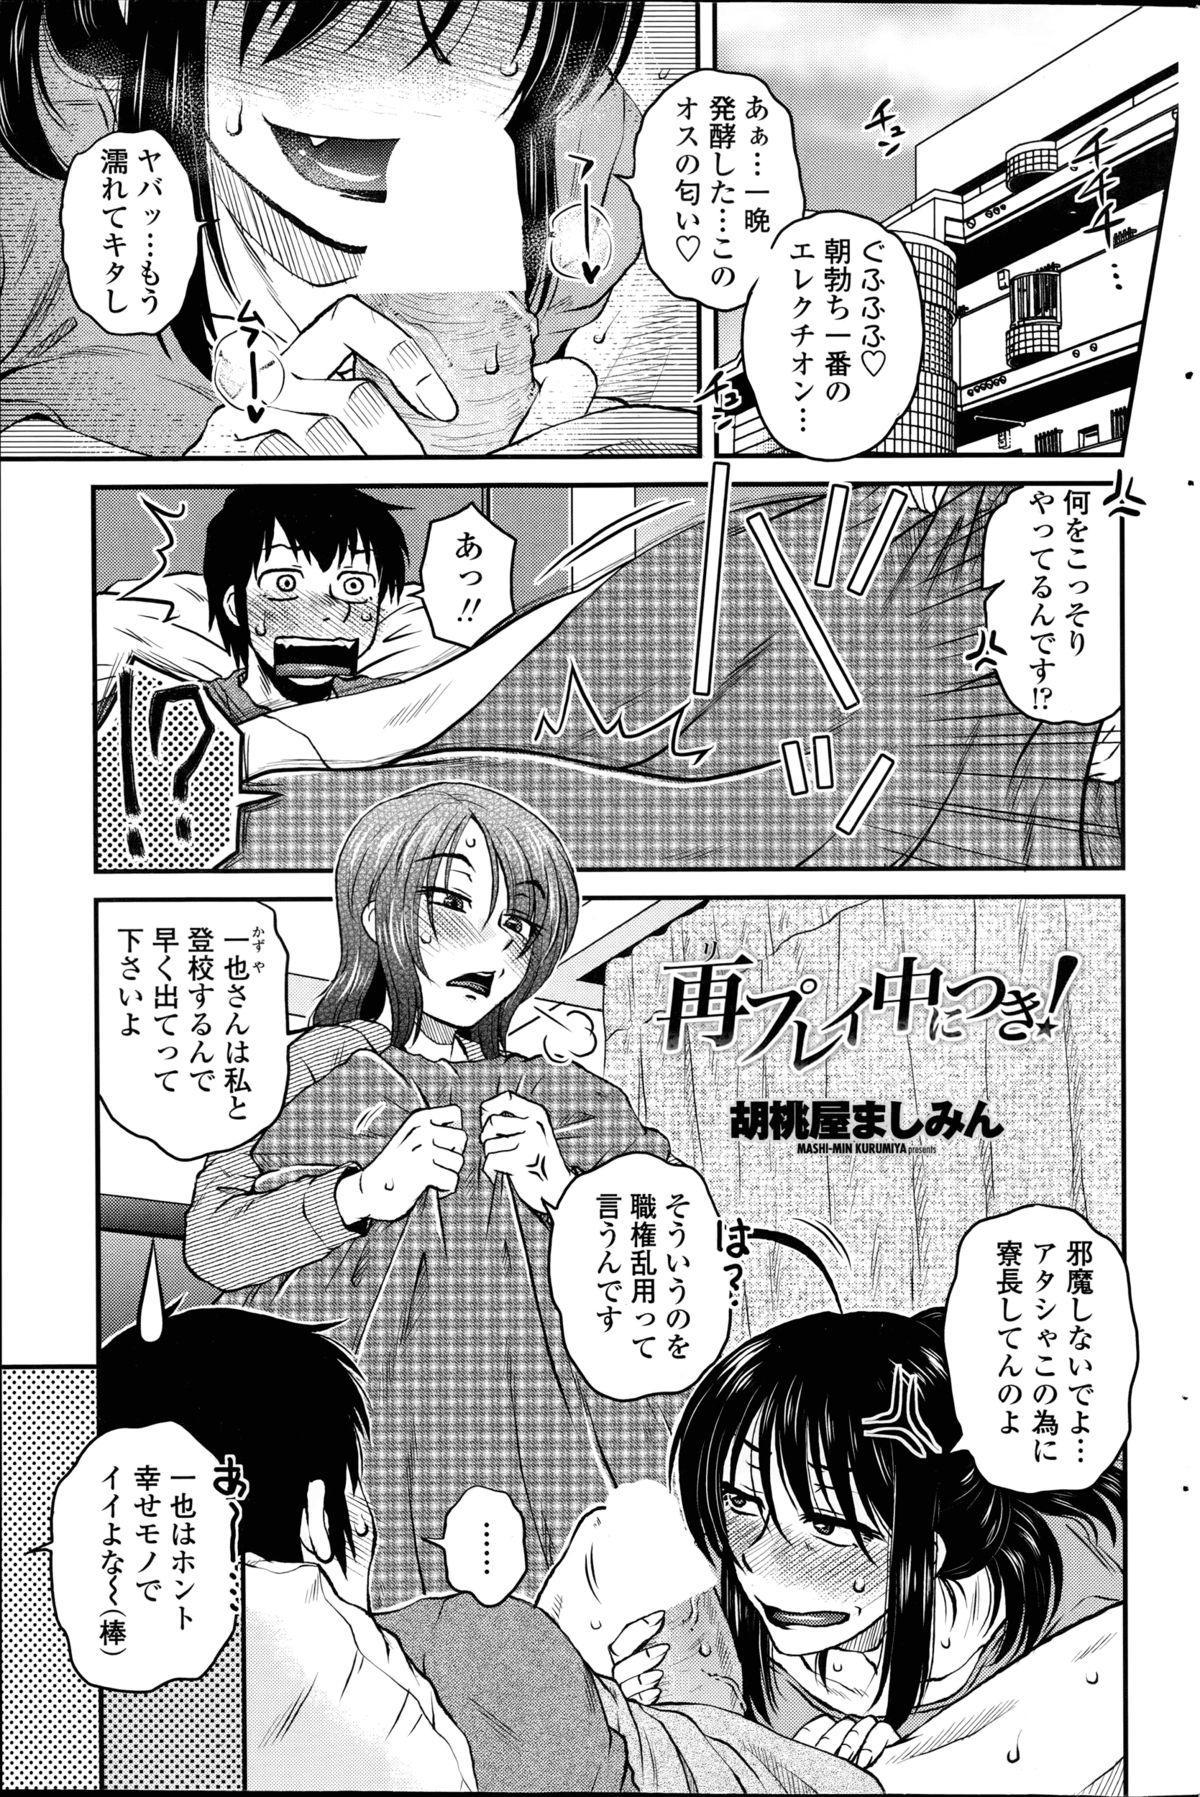 [Kurumiya Mashimin] Mikkai-chuu ni Tsuki Ch.1-6 60